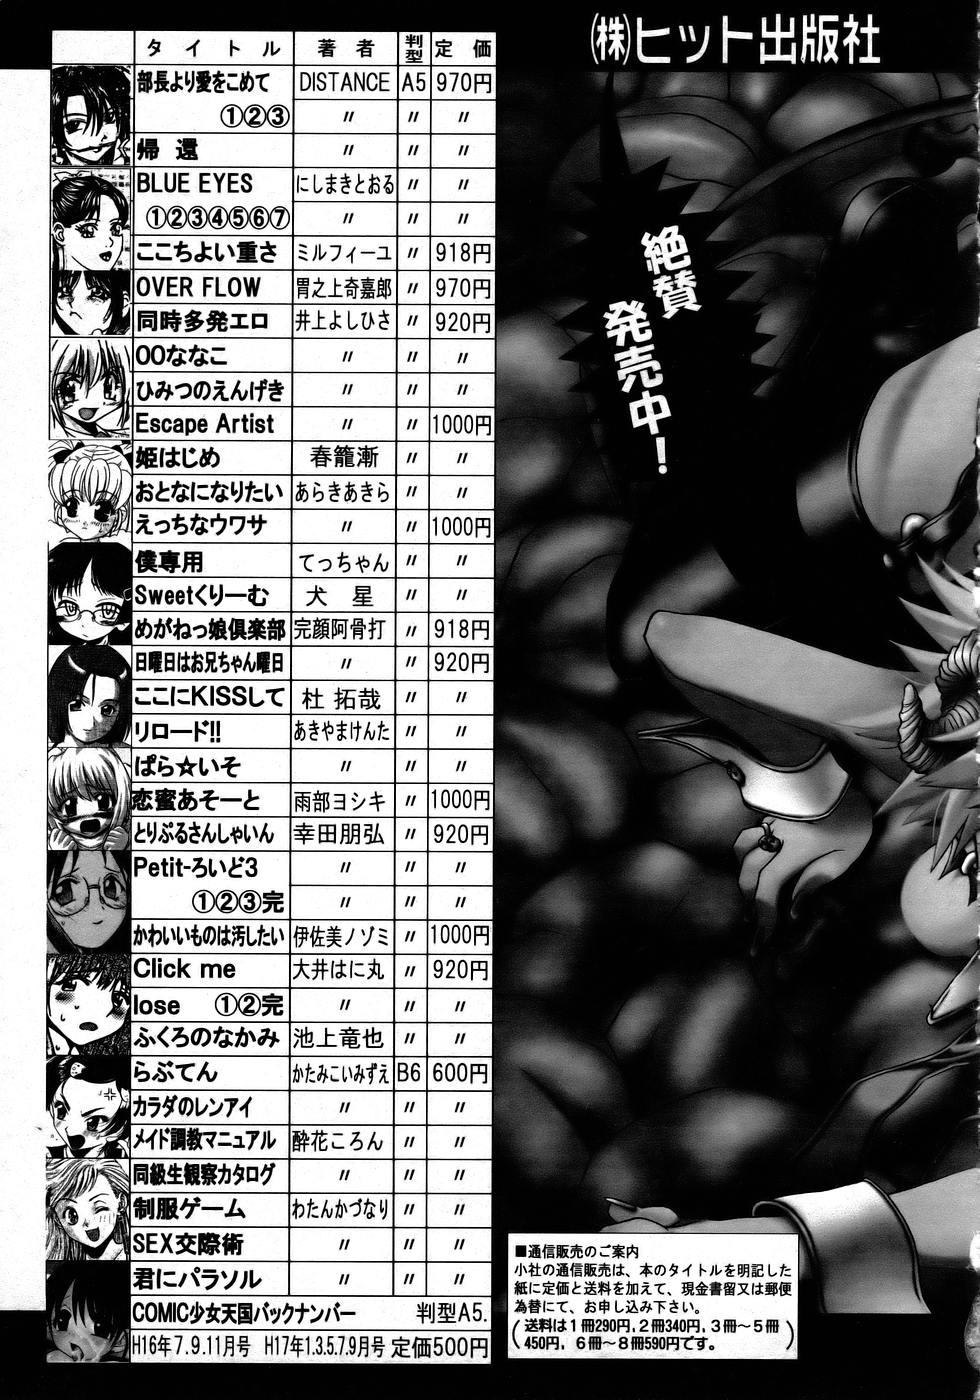 COMIC AUN 2005-12 Vol. 115 403